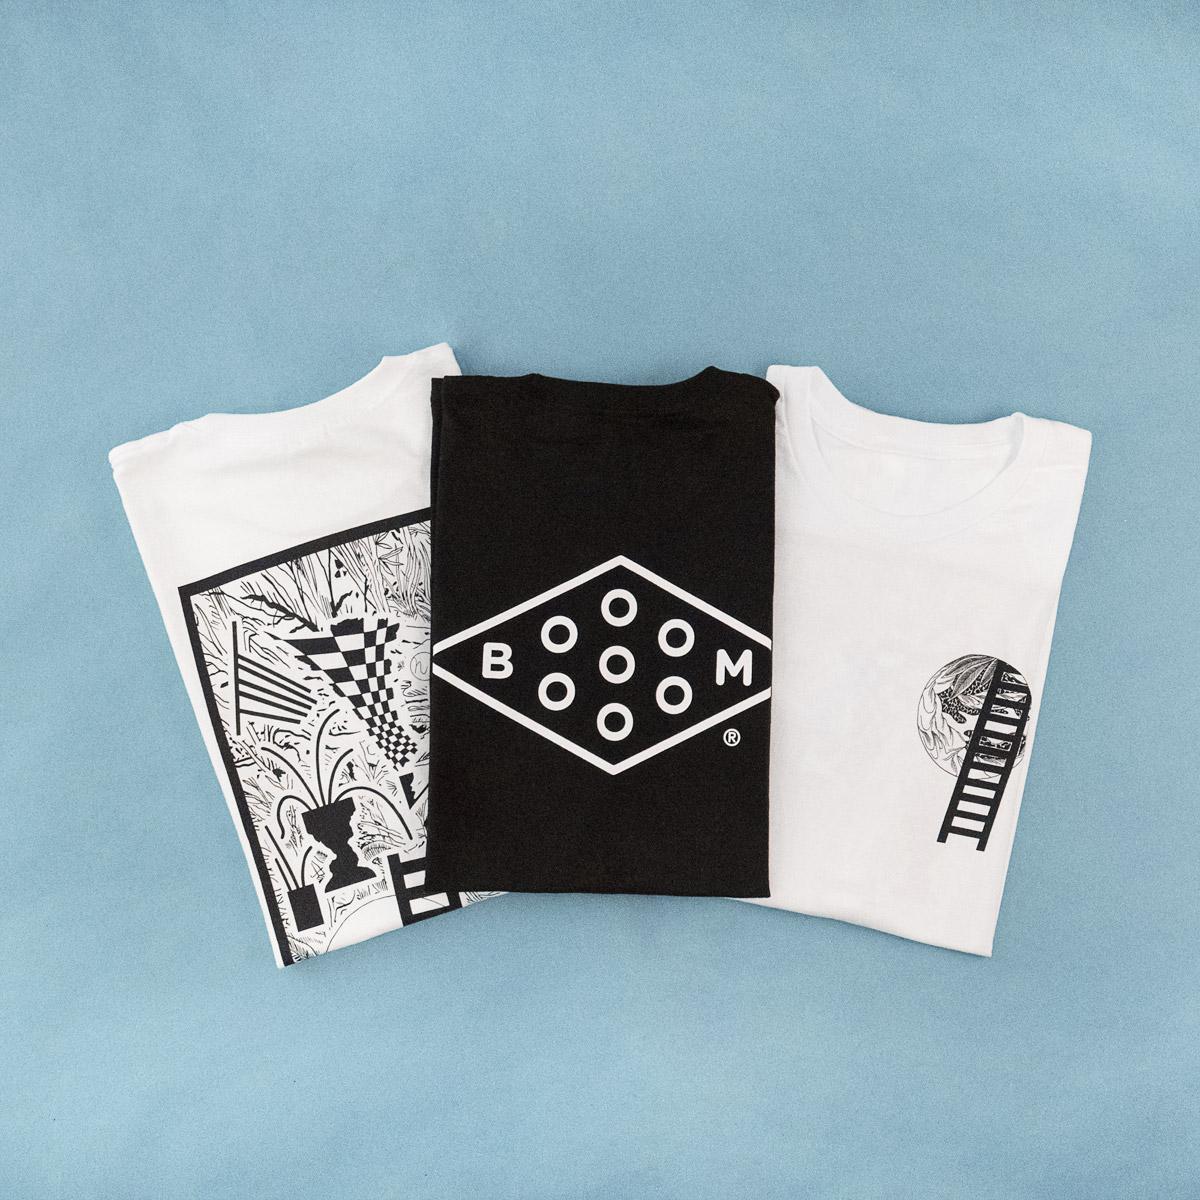 Booooooom T-Shirts